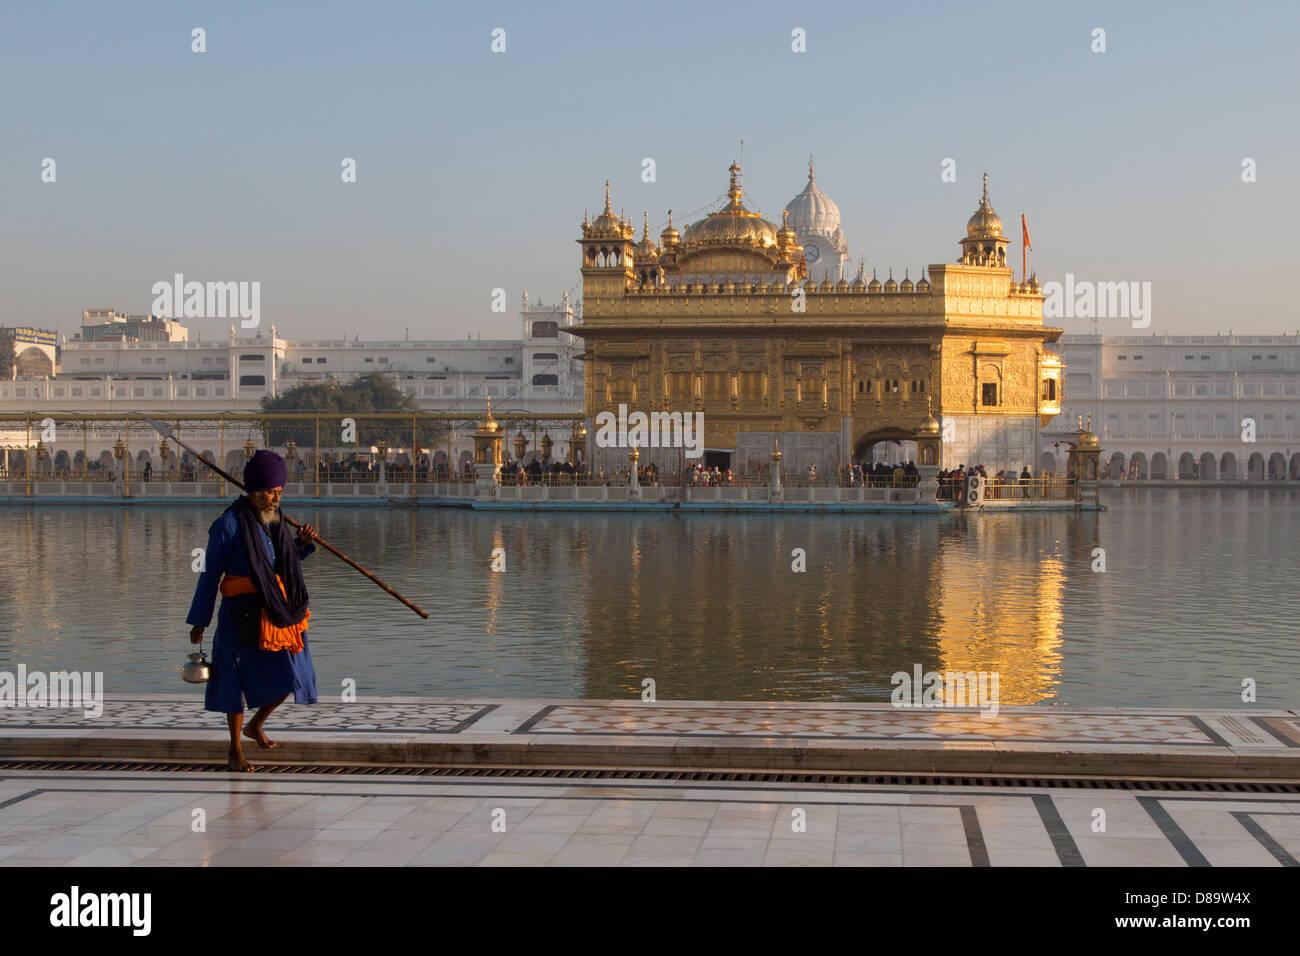 India, Punjab, Amritsar. golden Temple, Holy man visiting complex - Stock Image